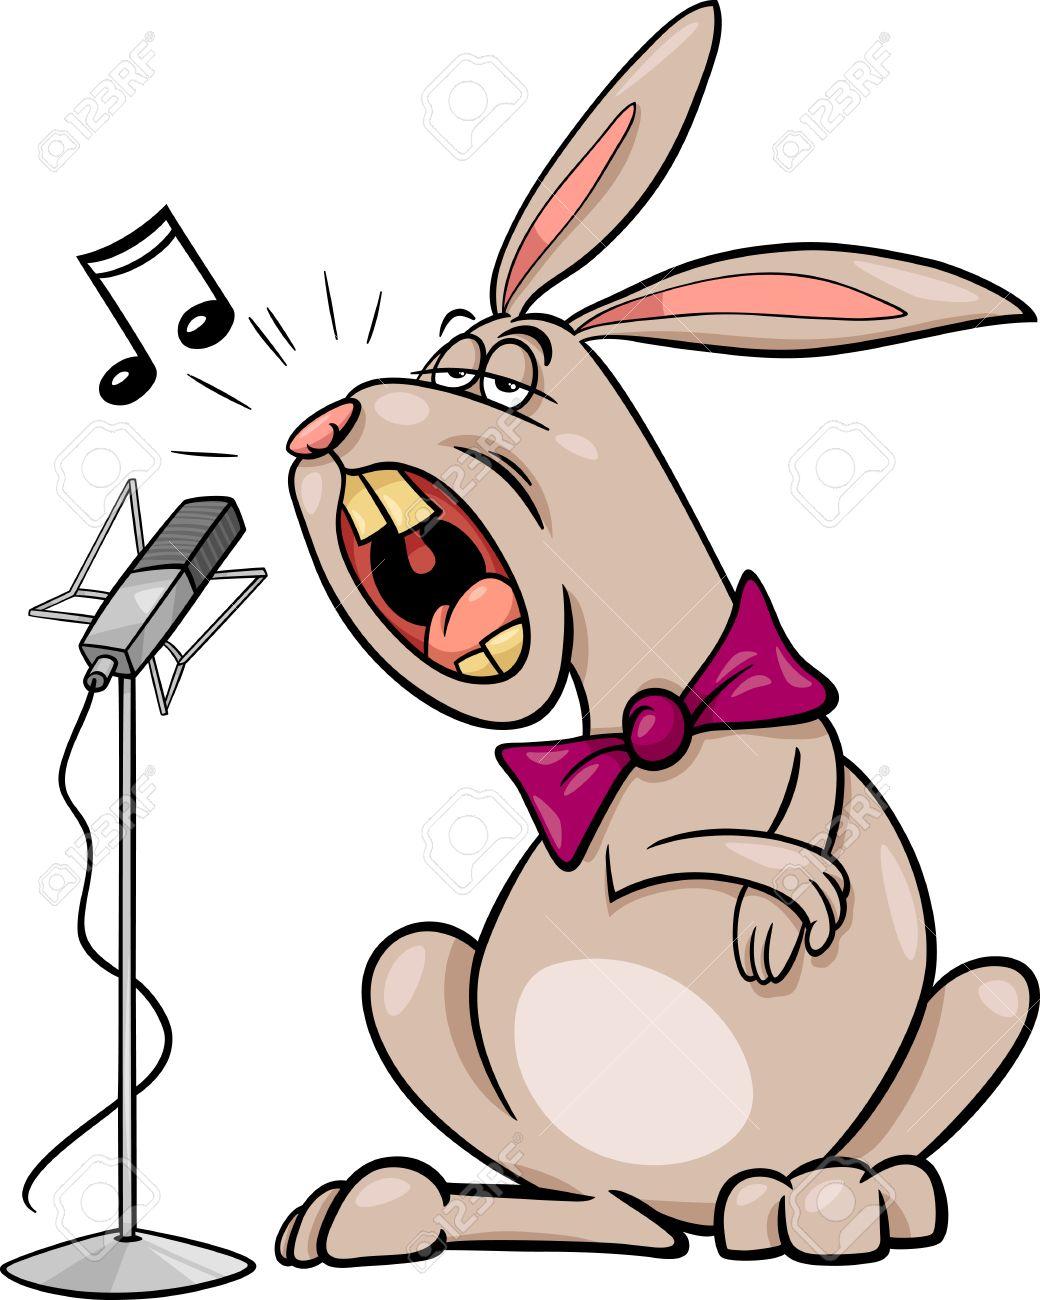 Cartoon Illustration of Funny Singing Rabbit Character.